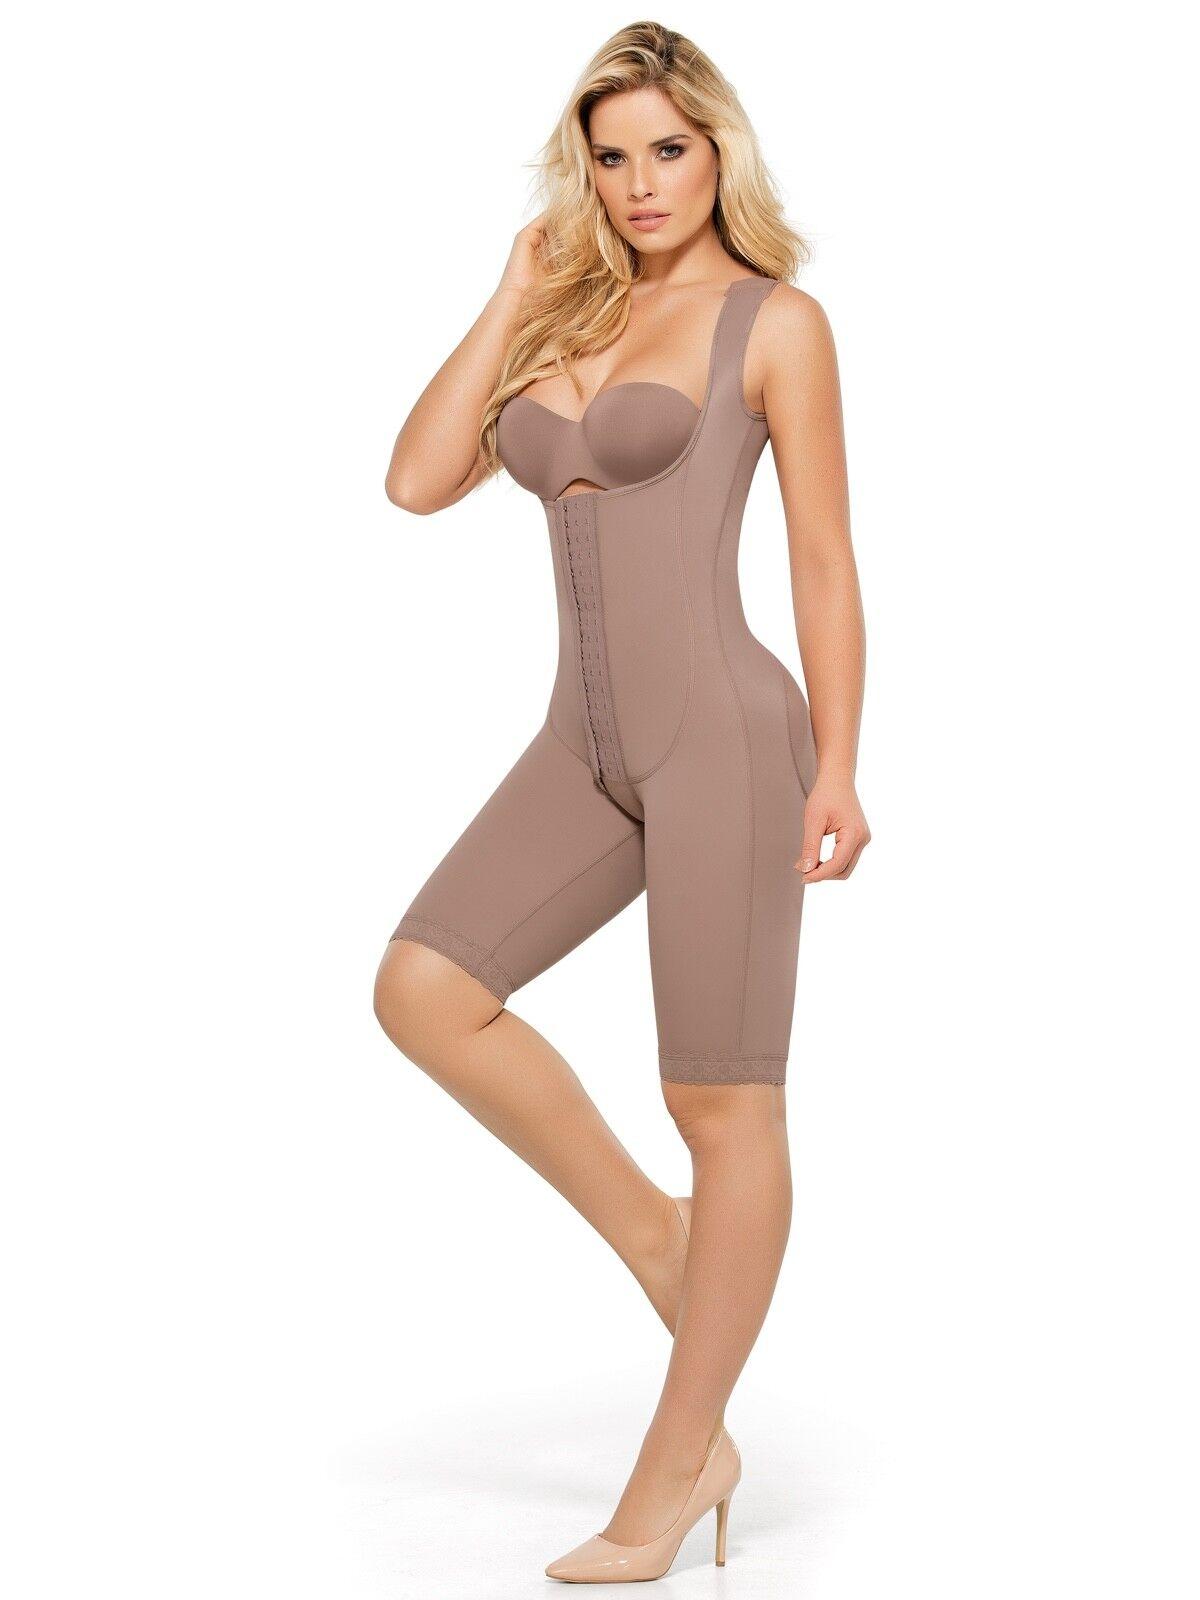 Ann Chery 5176 INGRID Spandex body shaper, sleeveless